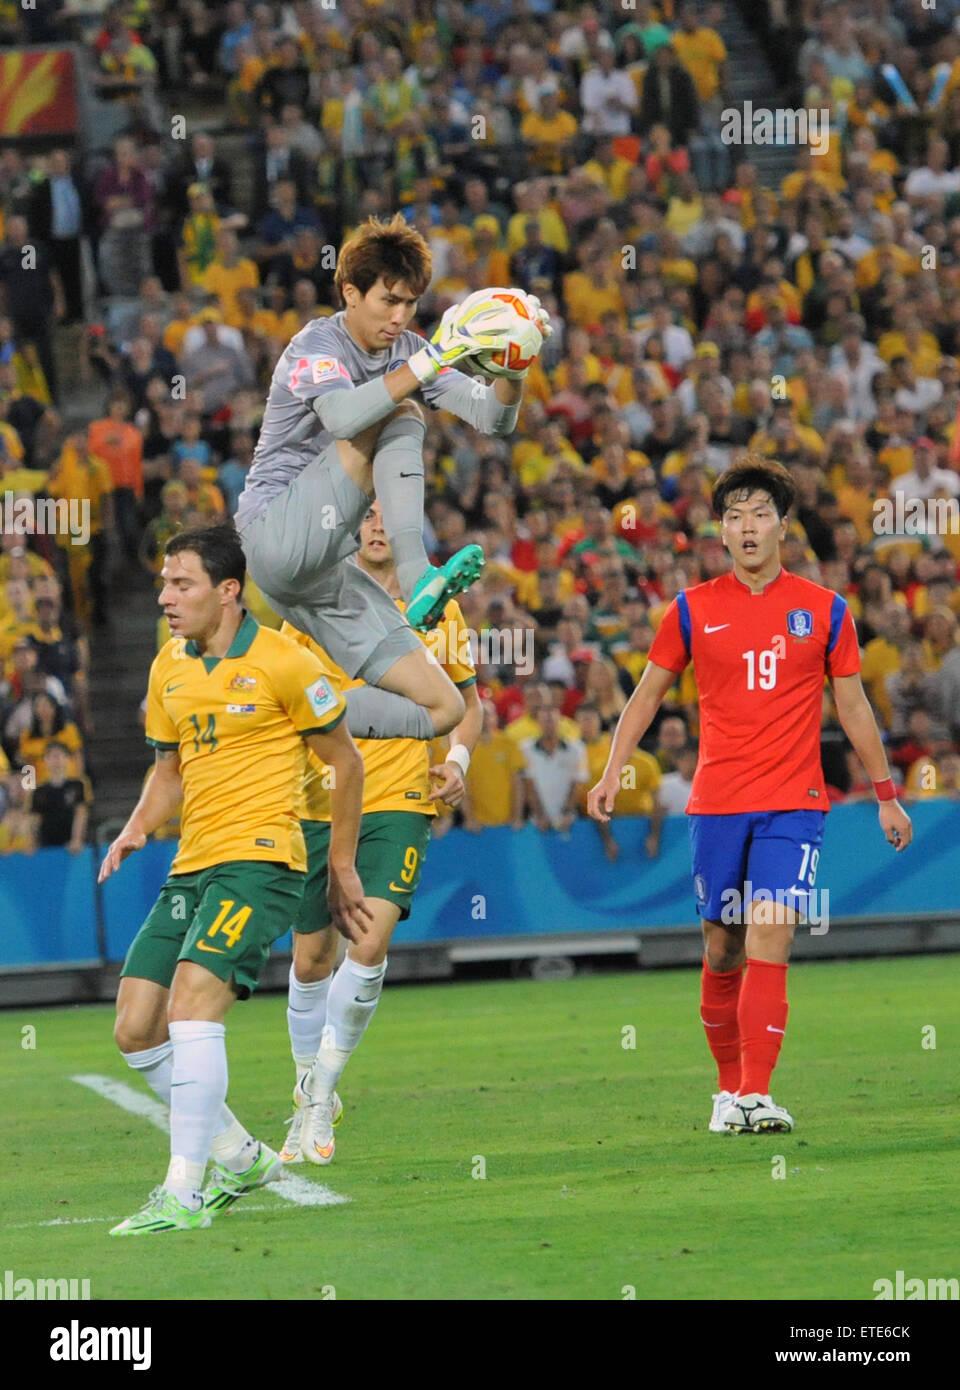 Asian Football Championship (AFC) - Final - Australia (2) v (1) South Korea  Featuring: Kim Jin Hyeon Where: Sydney, Australia When: 31 Jan 2015 Credit:  ...